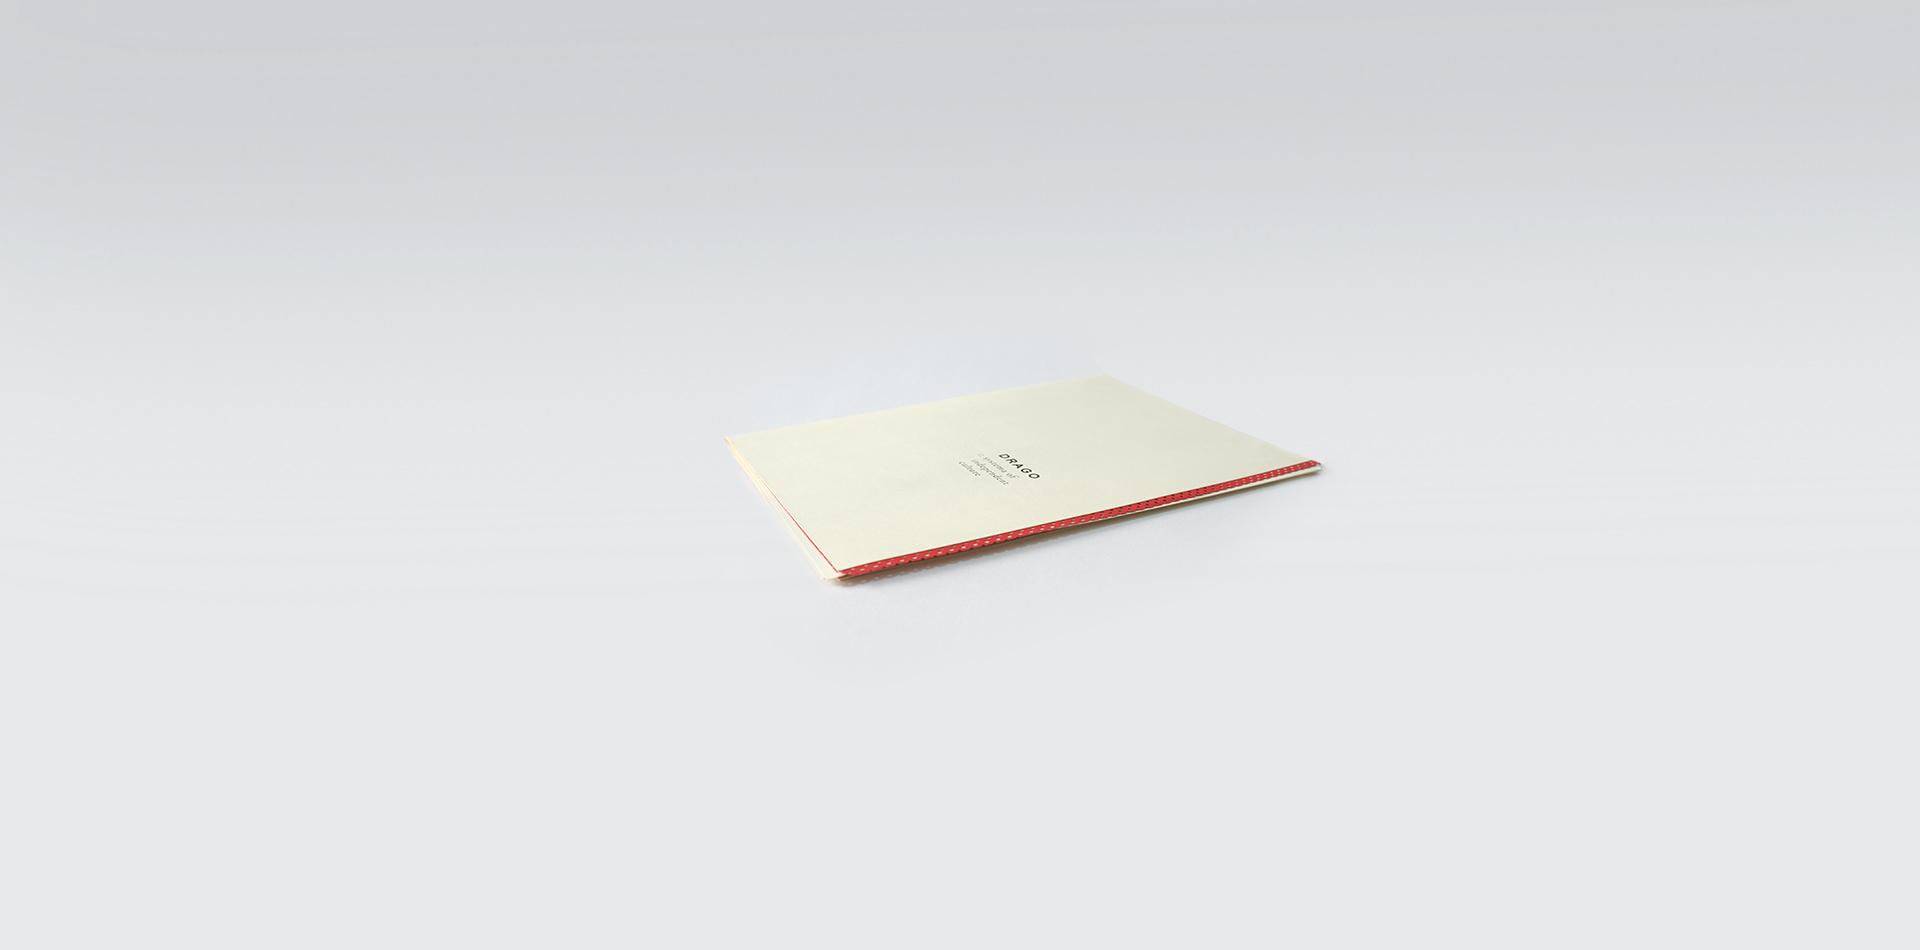 fabio-bevilacqua-drago2